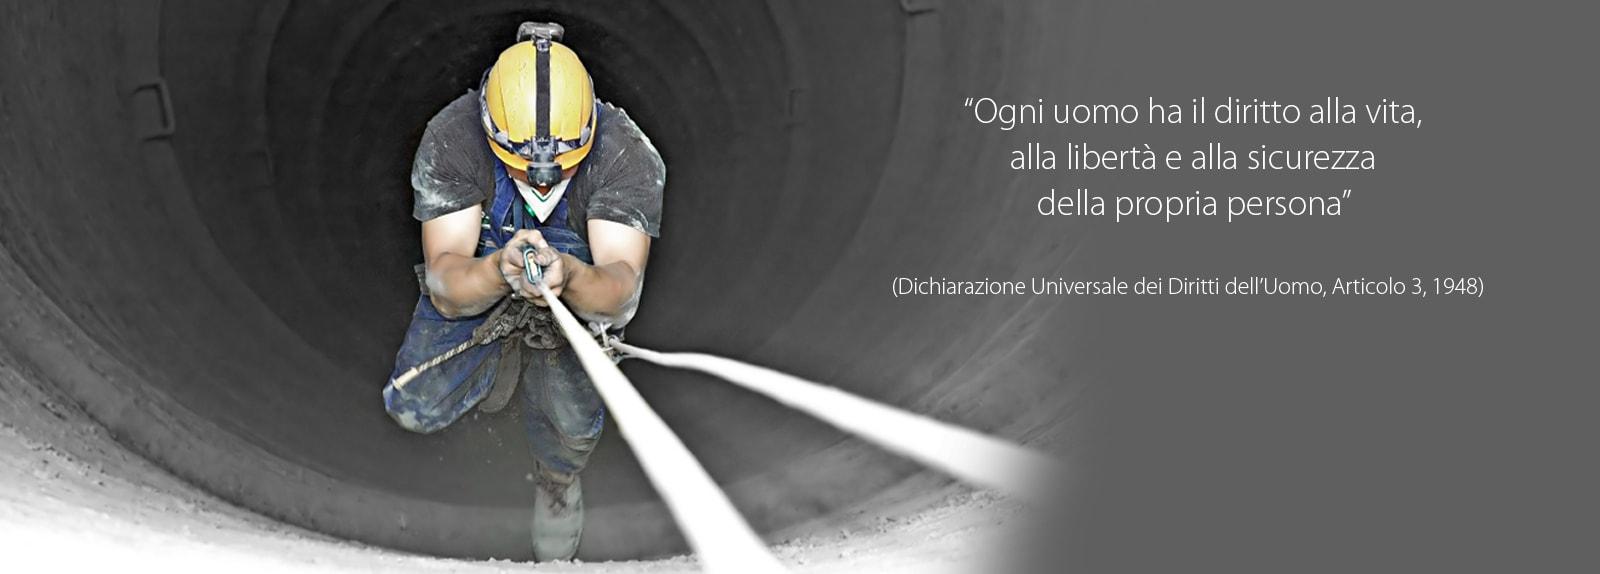 Linee Vita Brescia